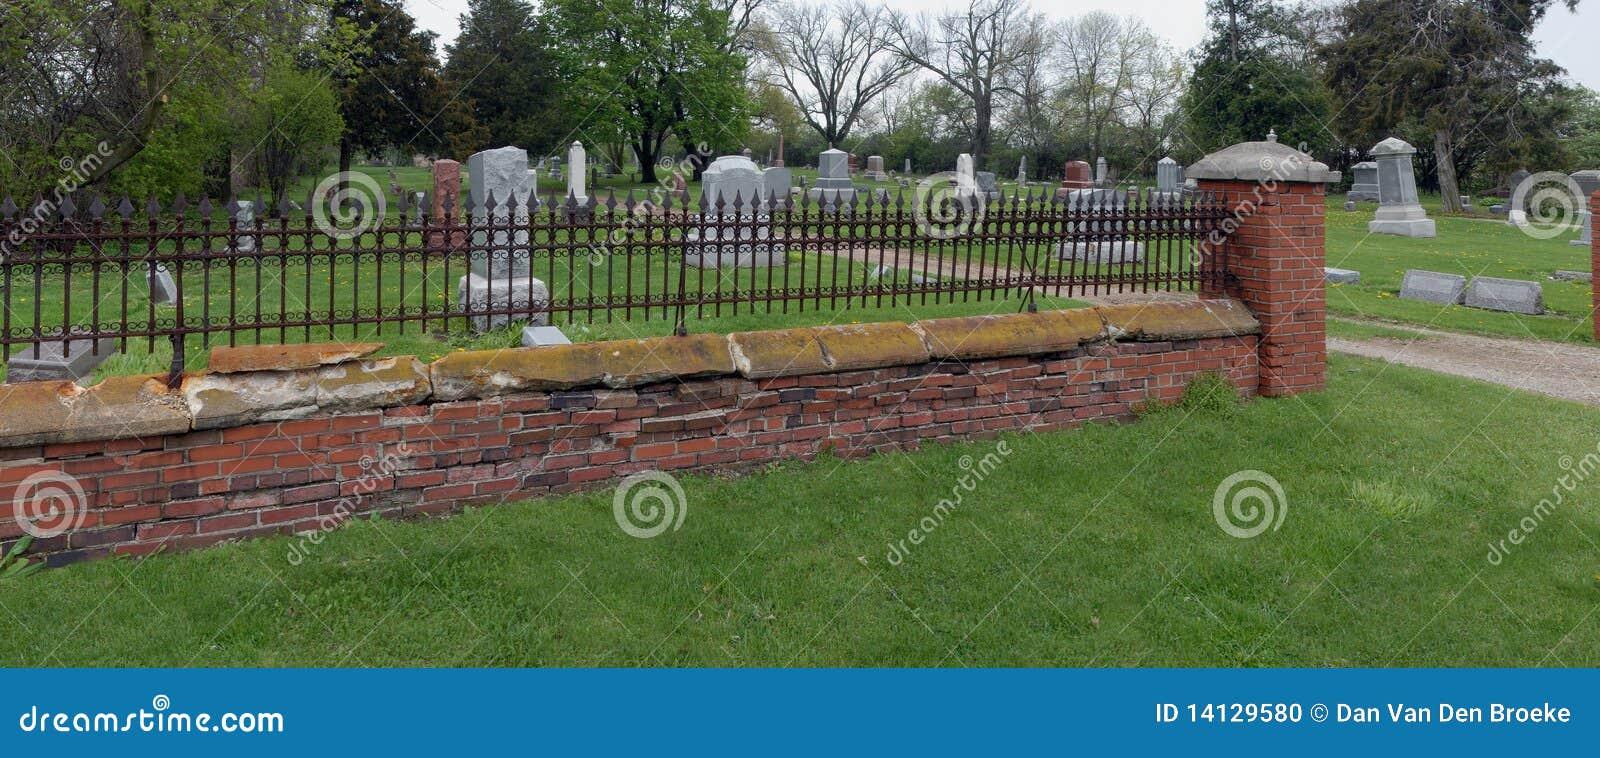 Rusty Iron Cemetery Fence Stock Photo Image Of Cross 14129580